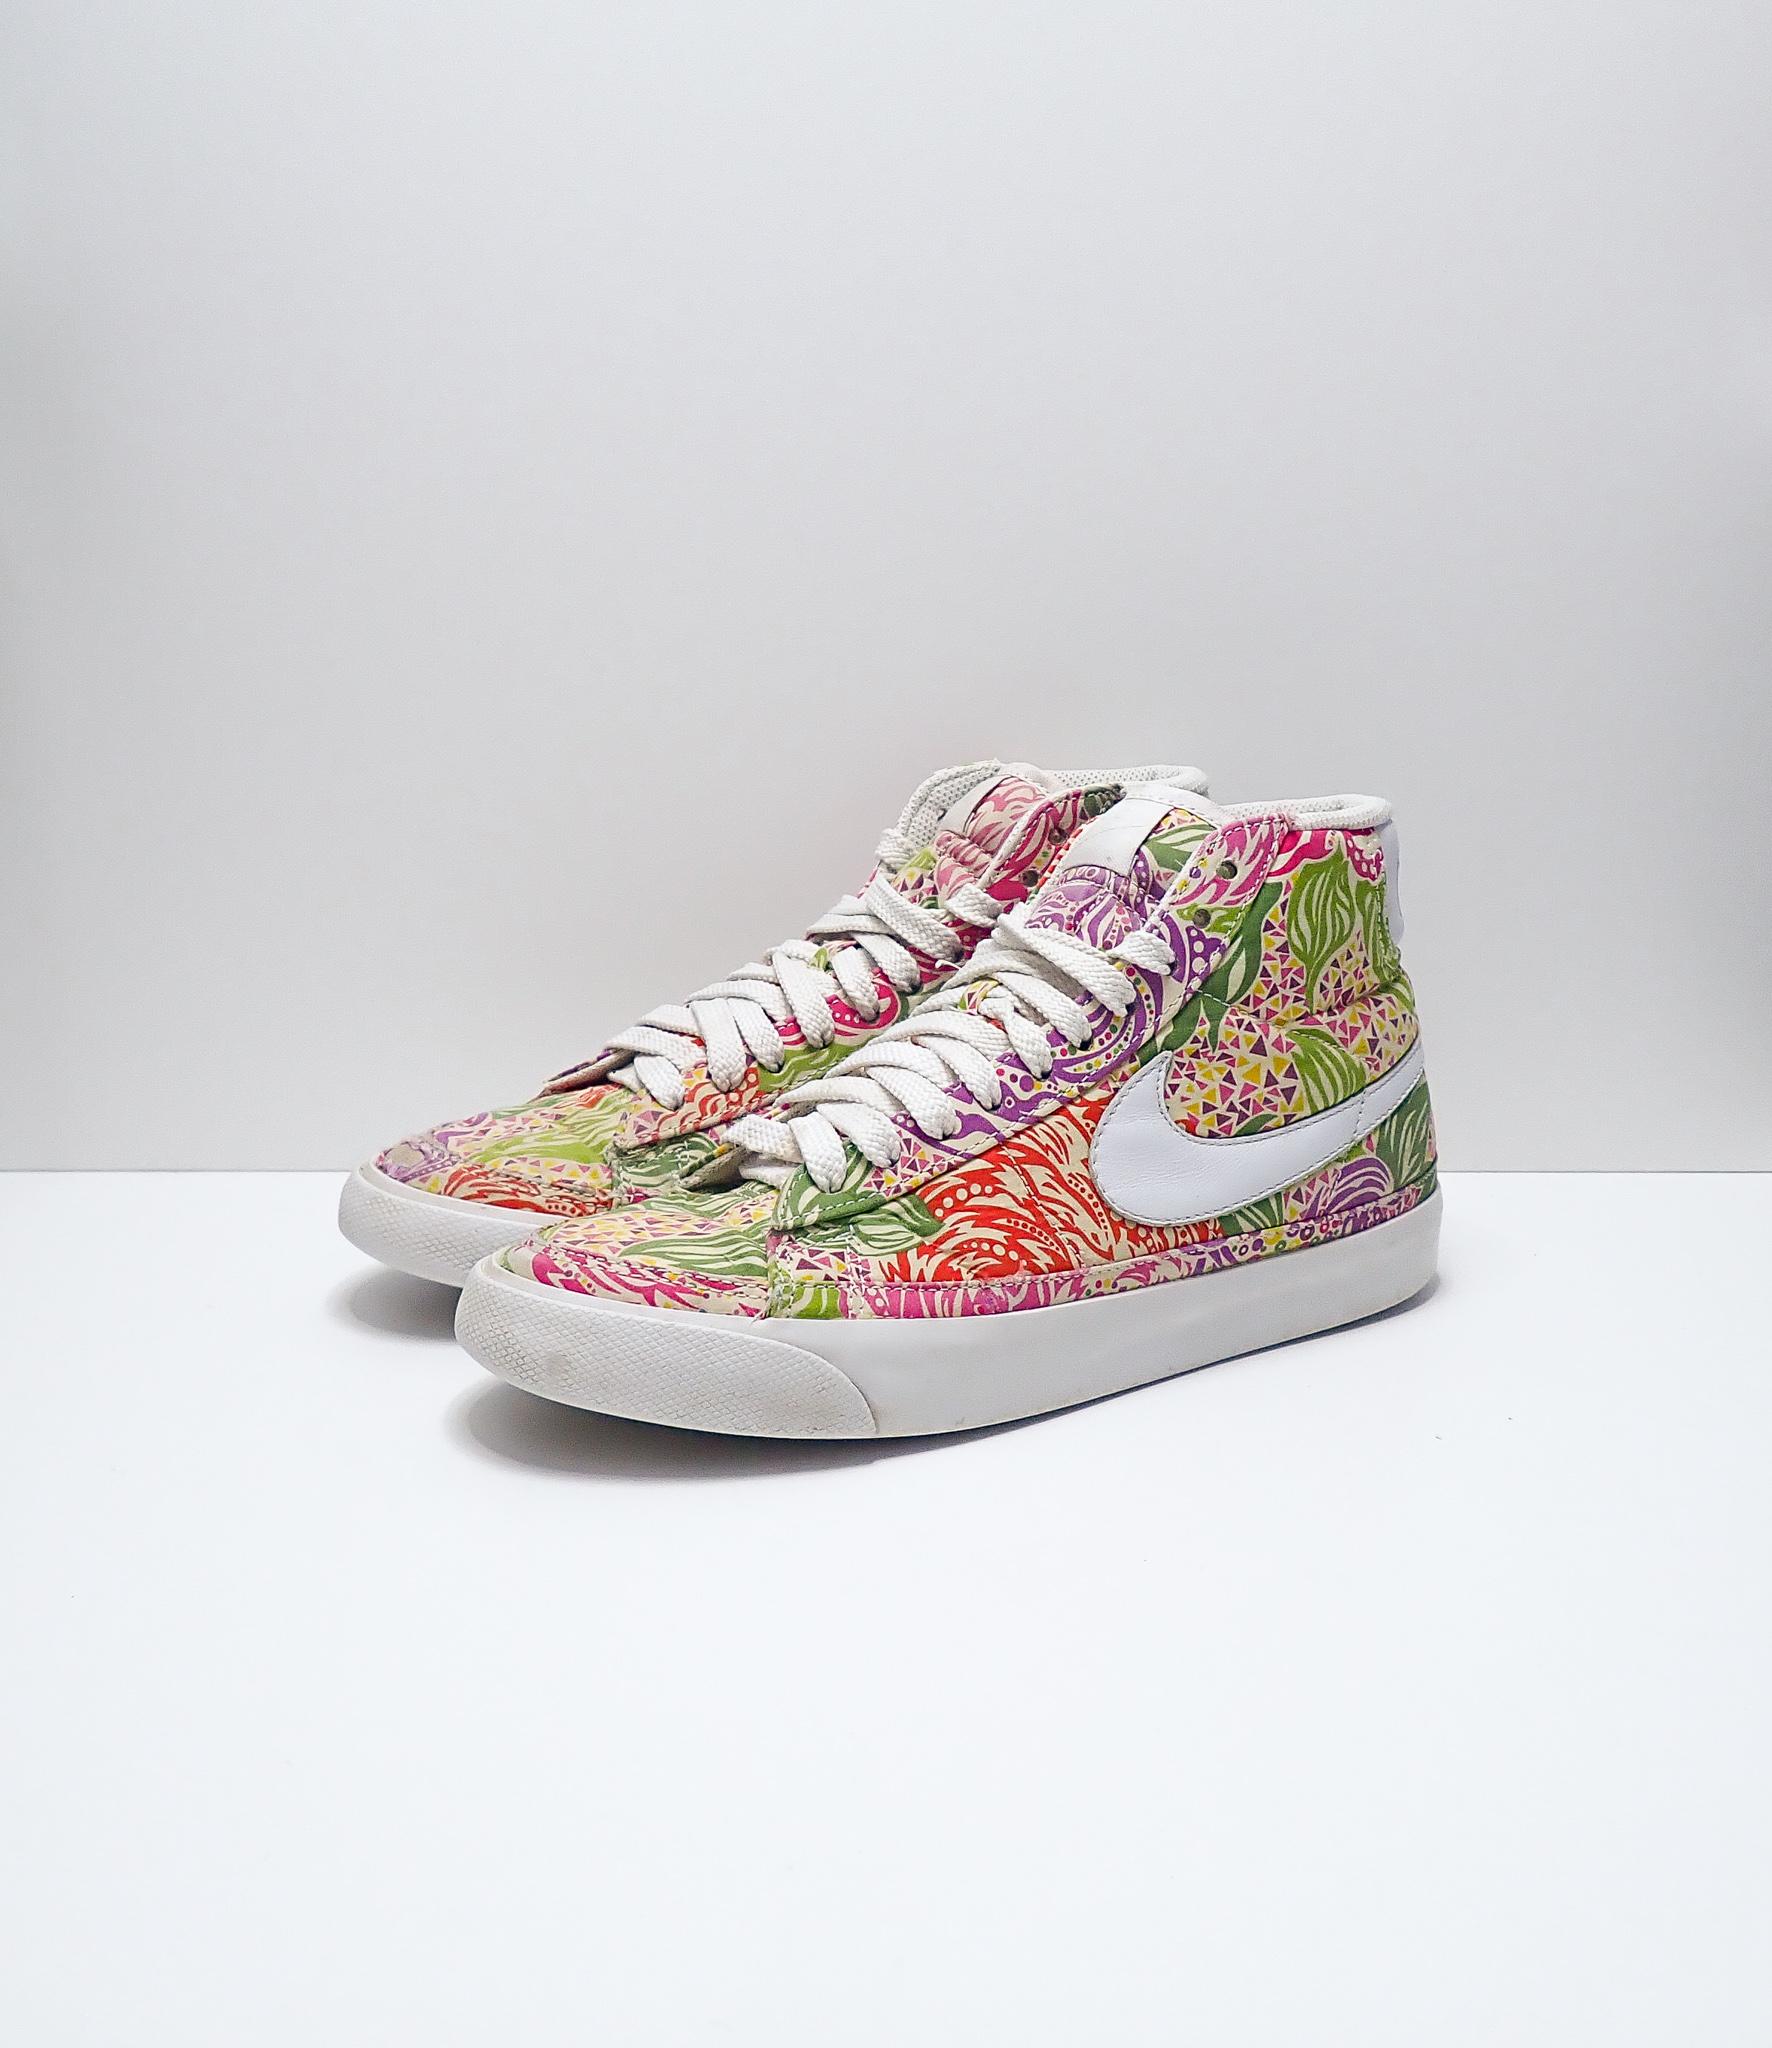 Nike Womens Blazer Mid Premium